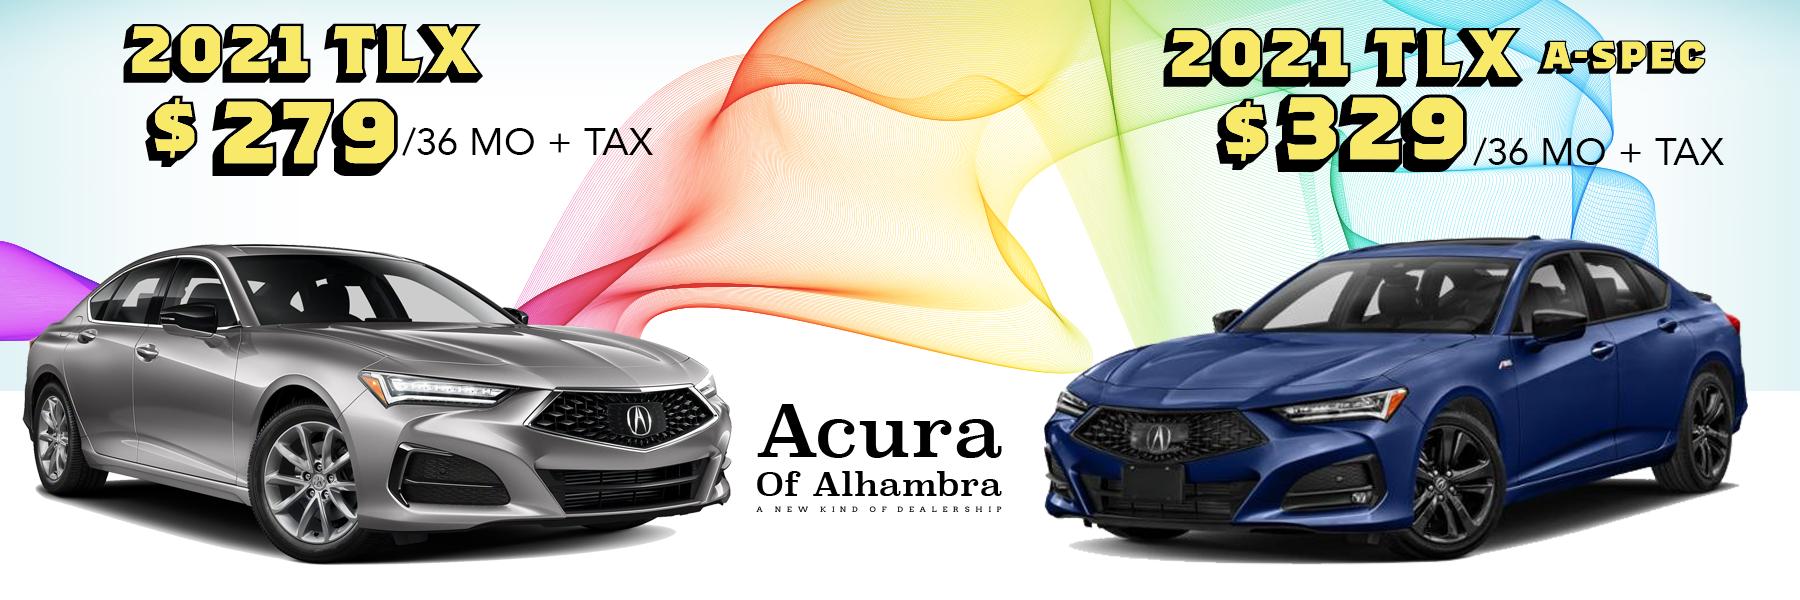 Web-Acura-TLX-2021–APRIL